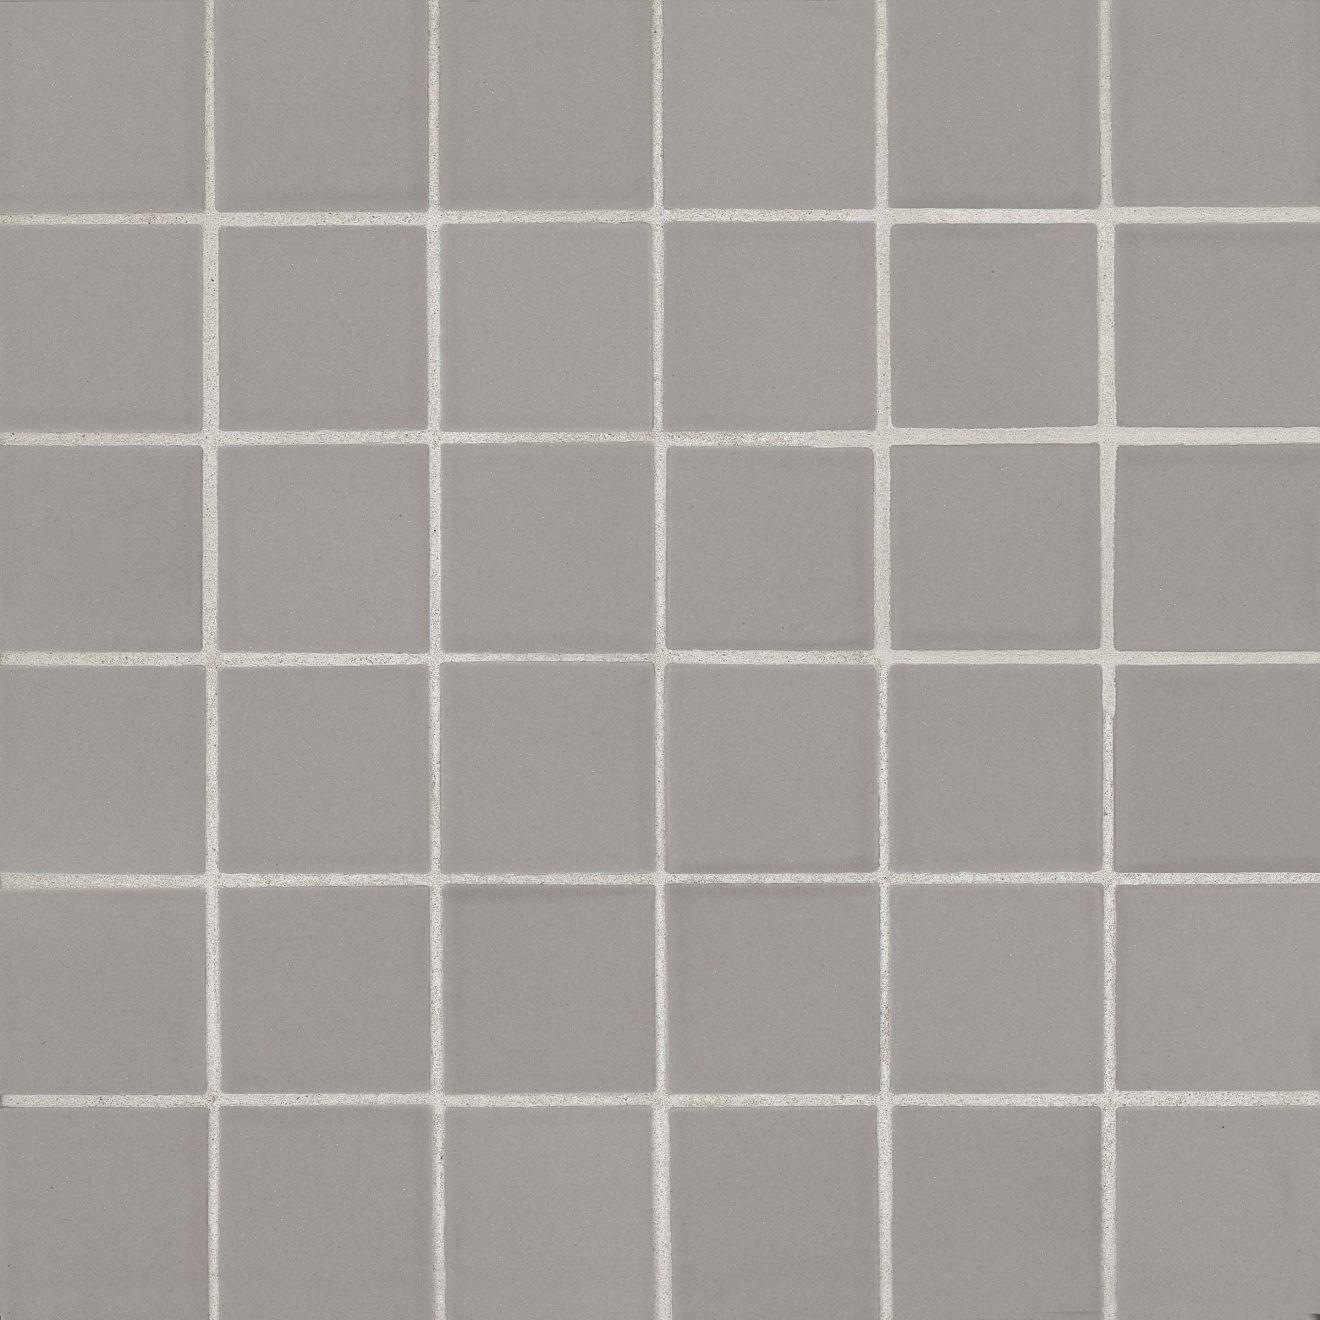 "True 2"" x 2"" Floor & Wall Mosaic in Grey"